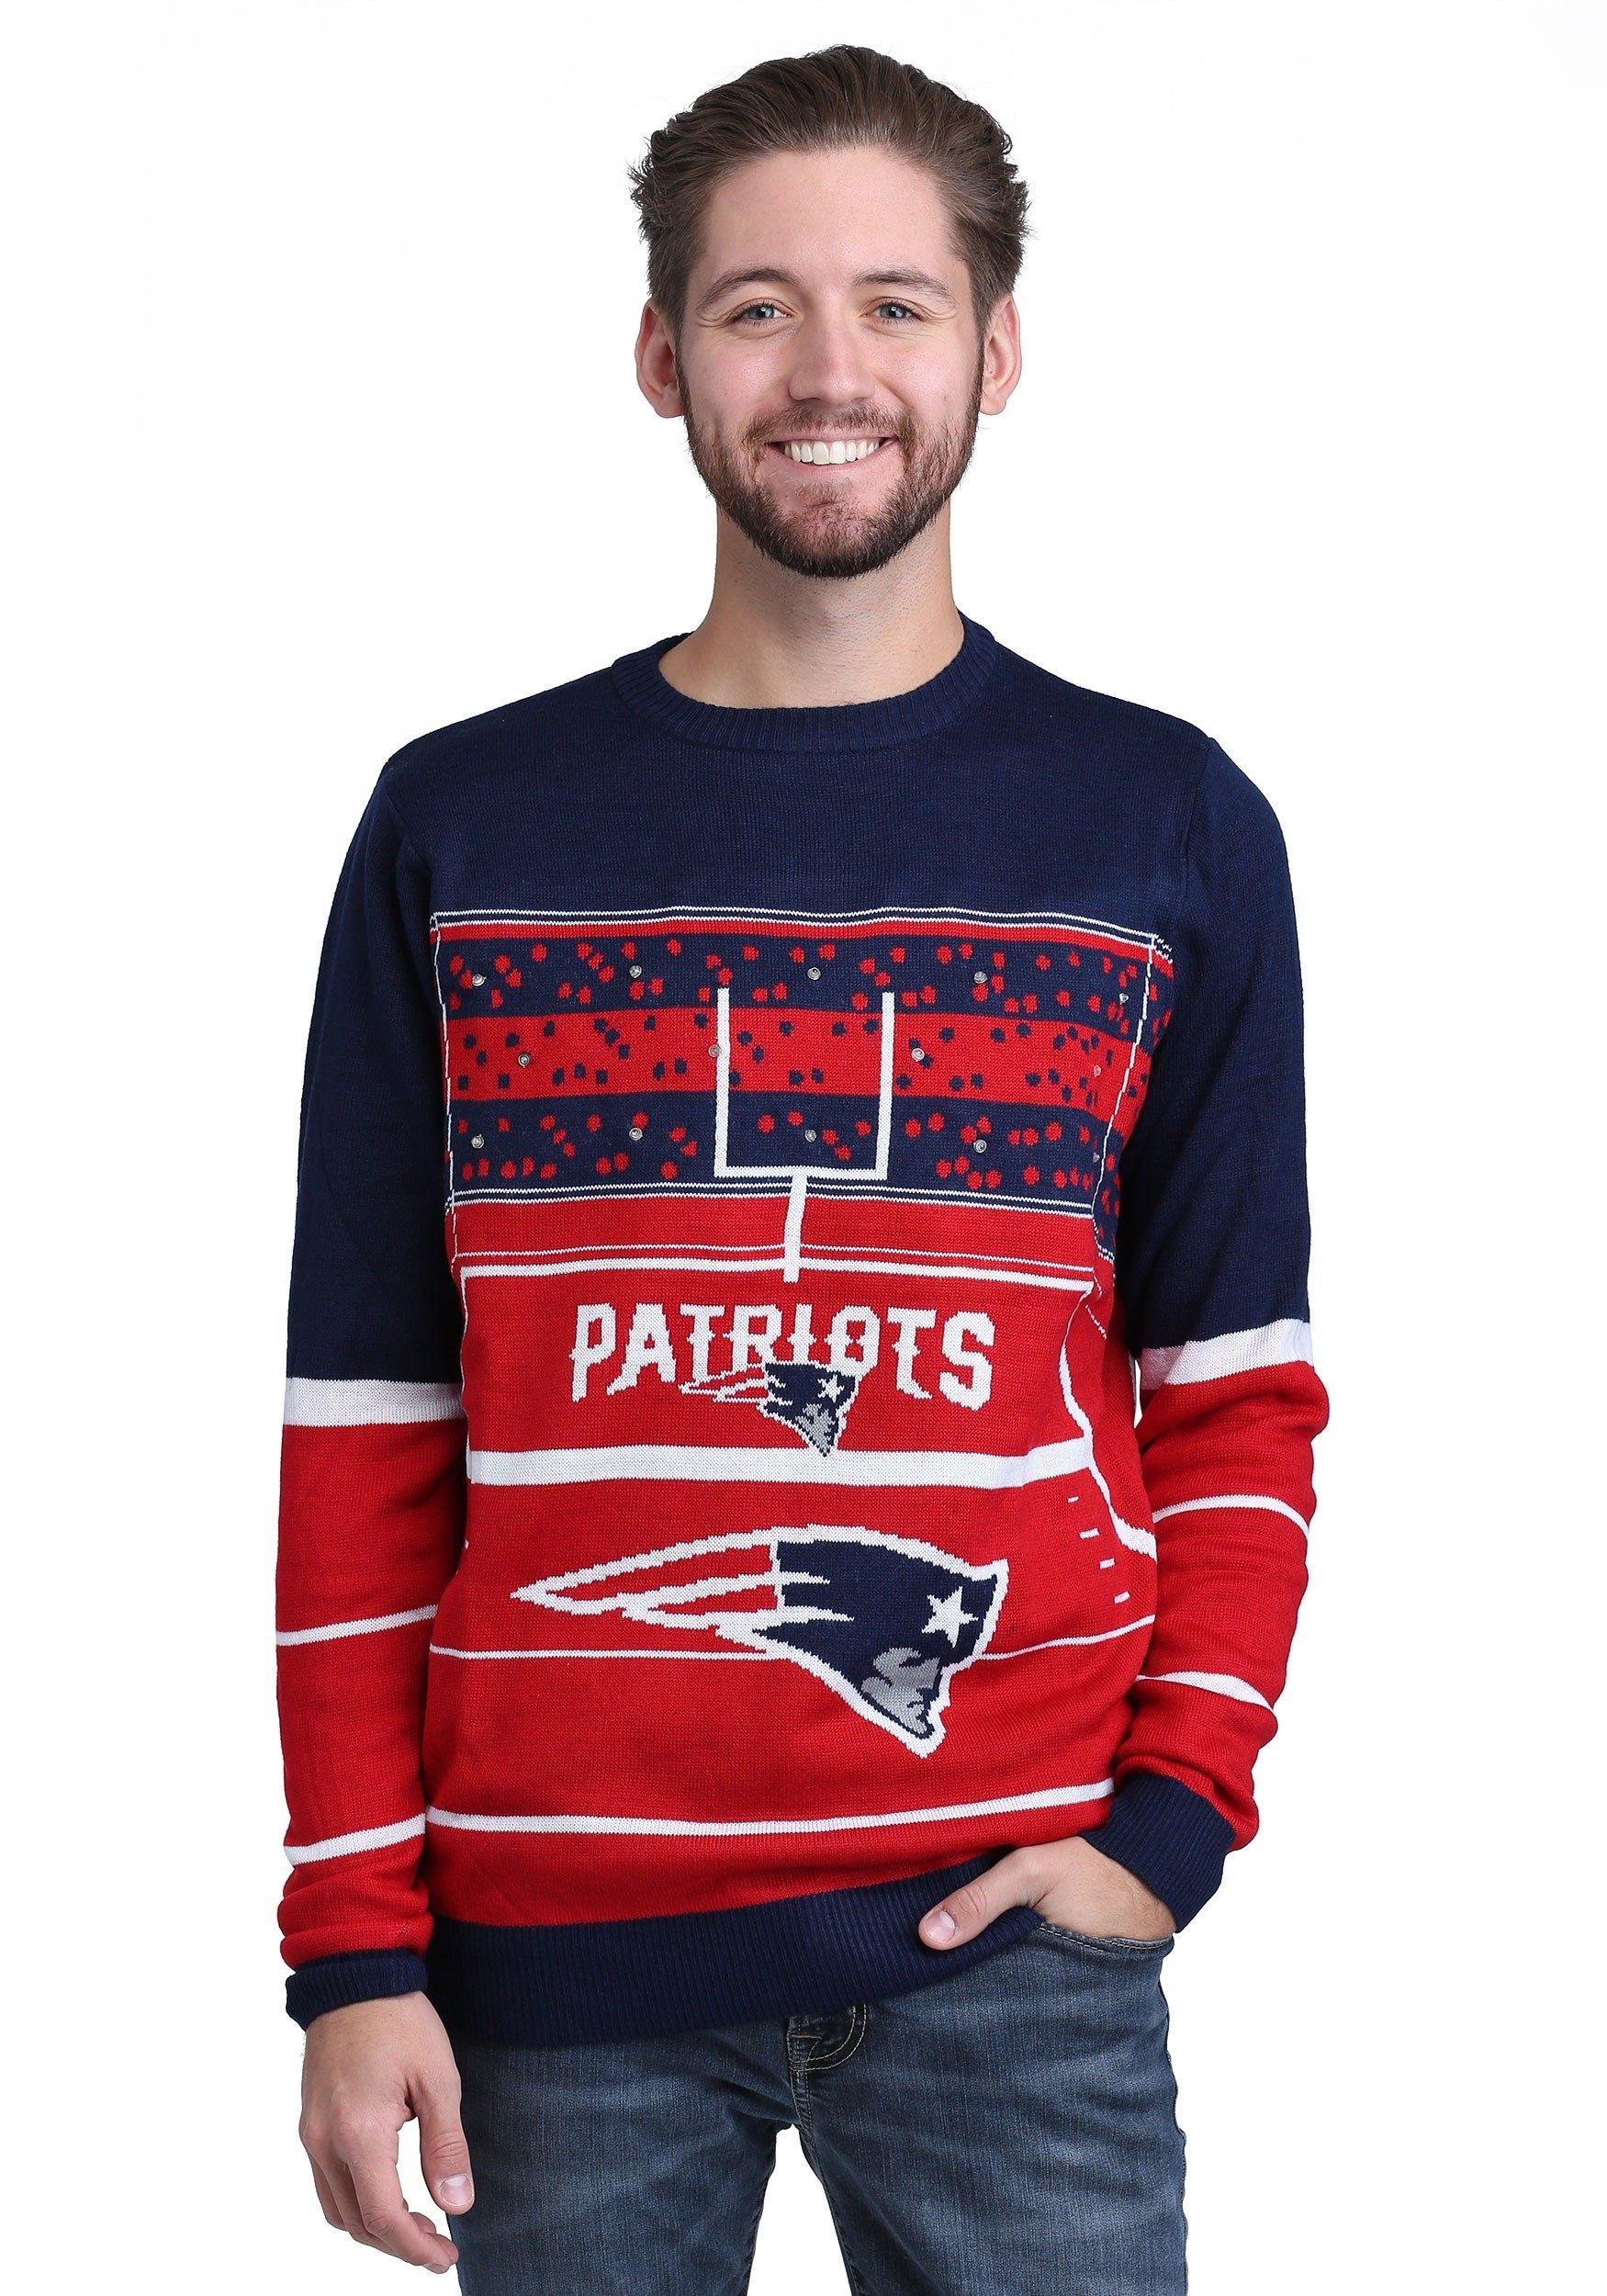 FOCO NFL New England Patriots Mens Stadium Light Up Crew Neck Sweaterstadium Light Up Crew Neck Sweater, Team Color, Large